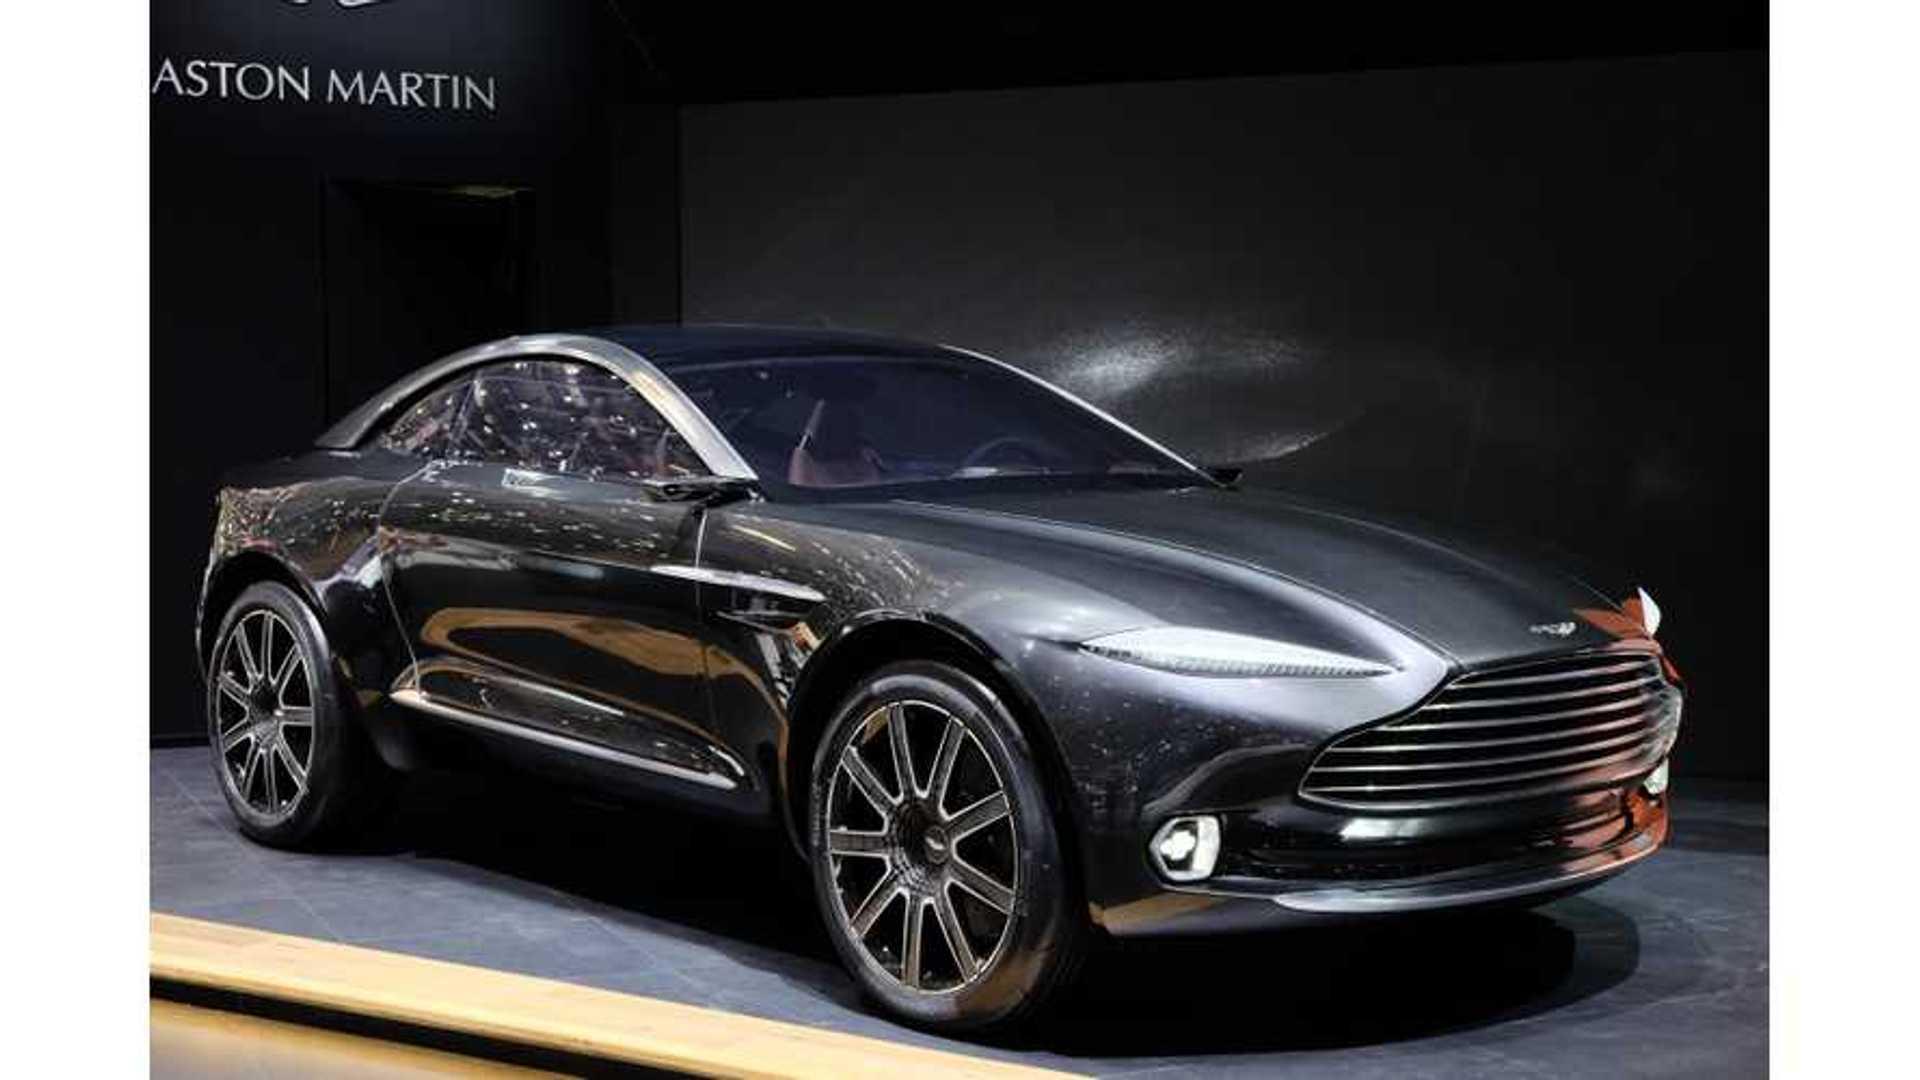 Aston Martin Dbx Live Images Videos From 2015 Geneva Motor Show